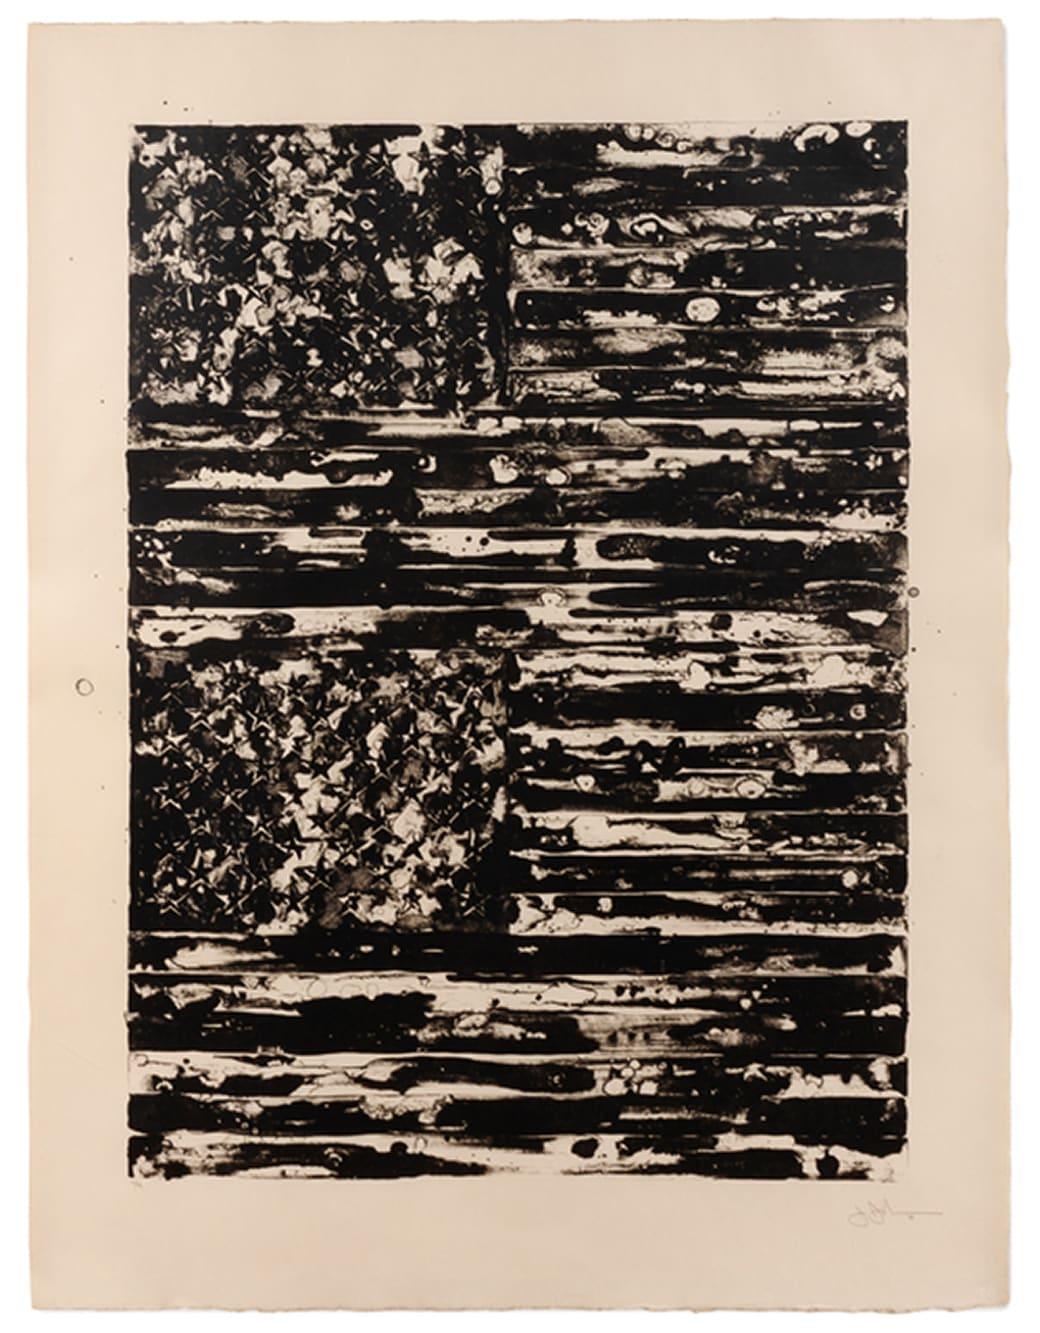 Jasper Johns, Two Flags, 1980